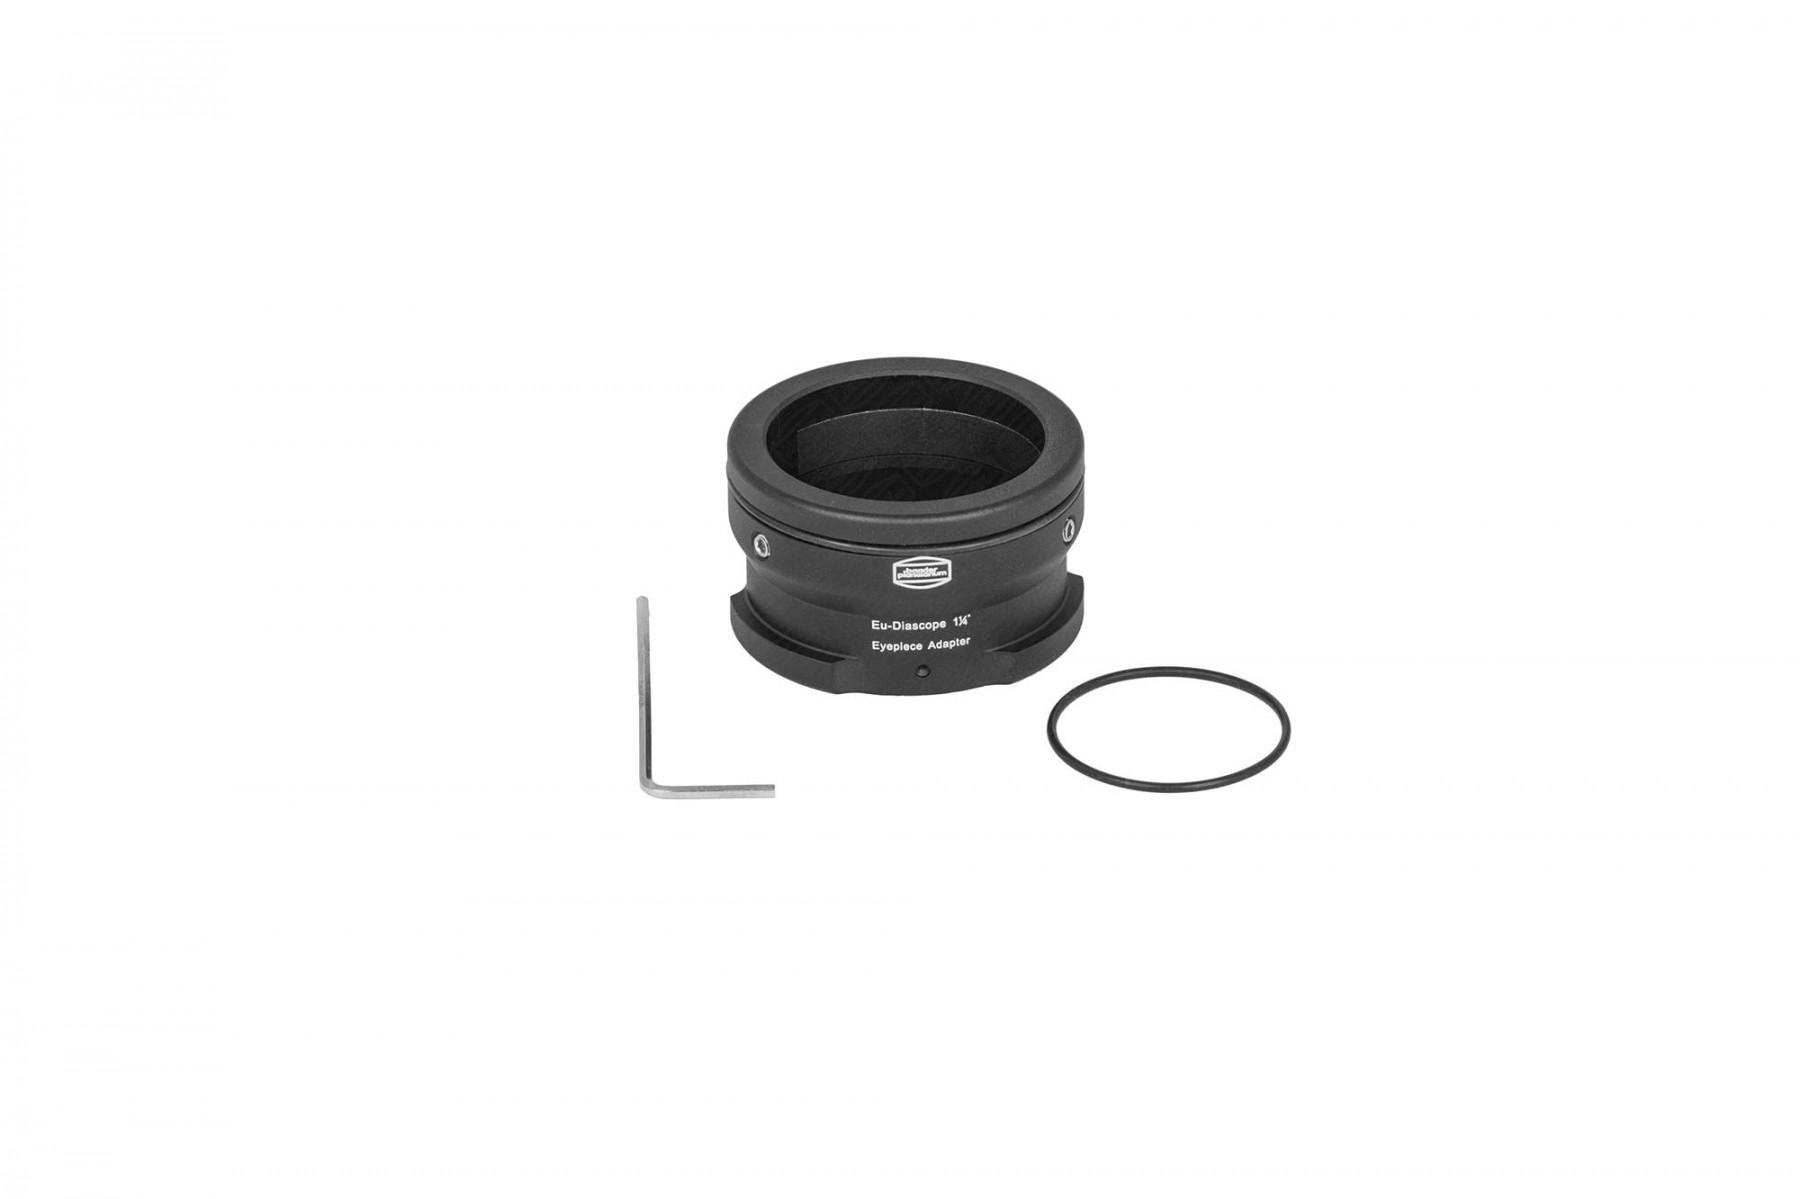 Lieferumfang: Zeiss Diascope Okularbajonett, Inbusschlüssel, 2x O-Ringe (1x montiert)